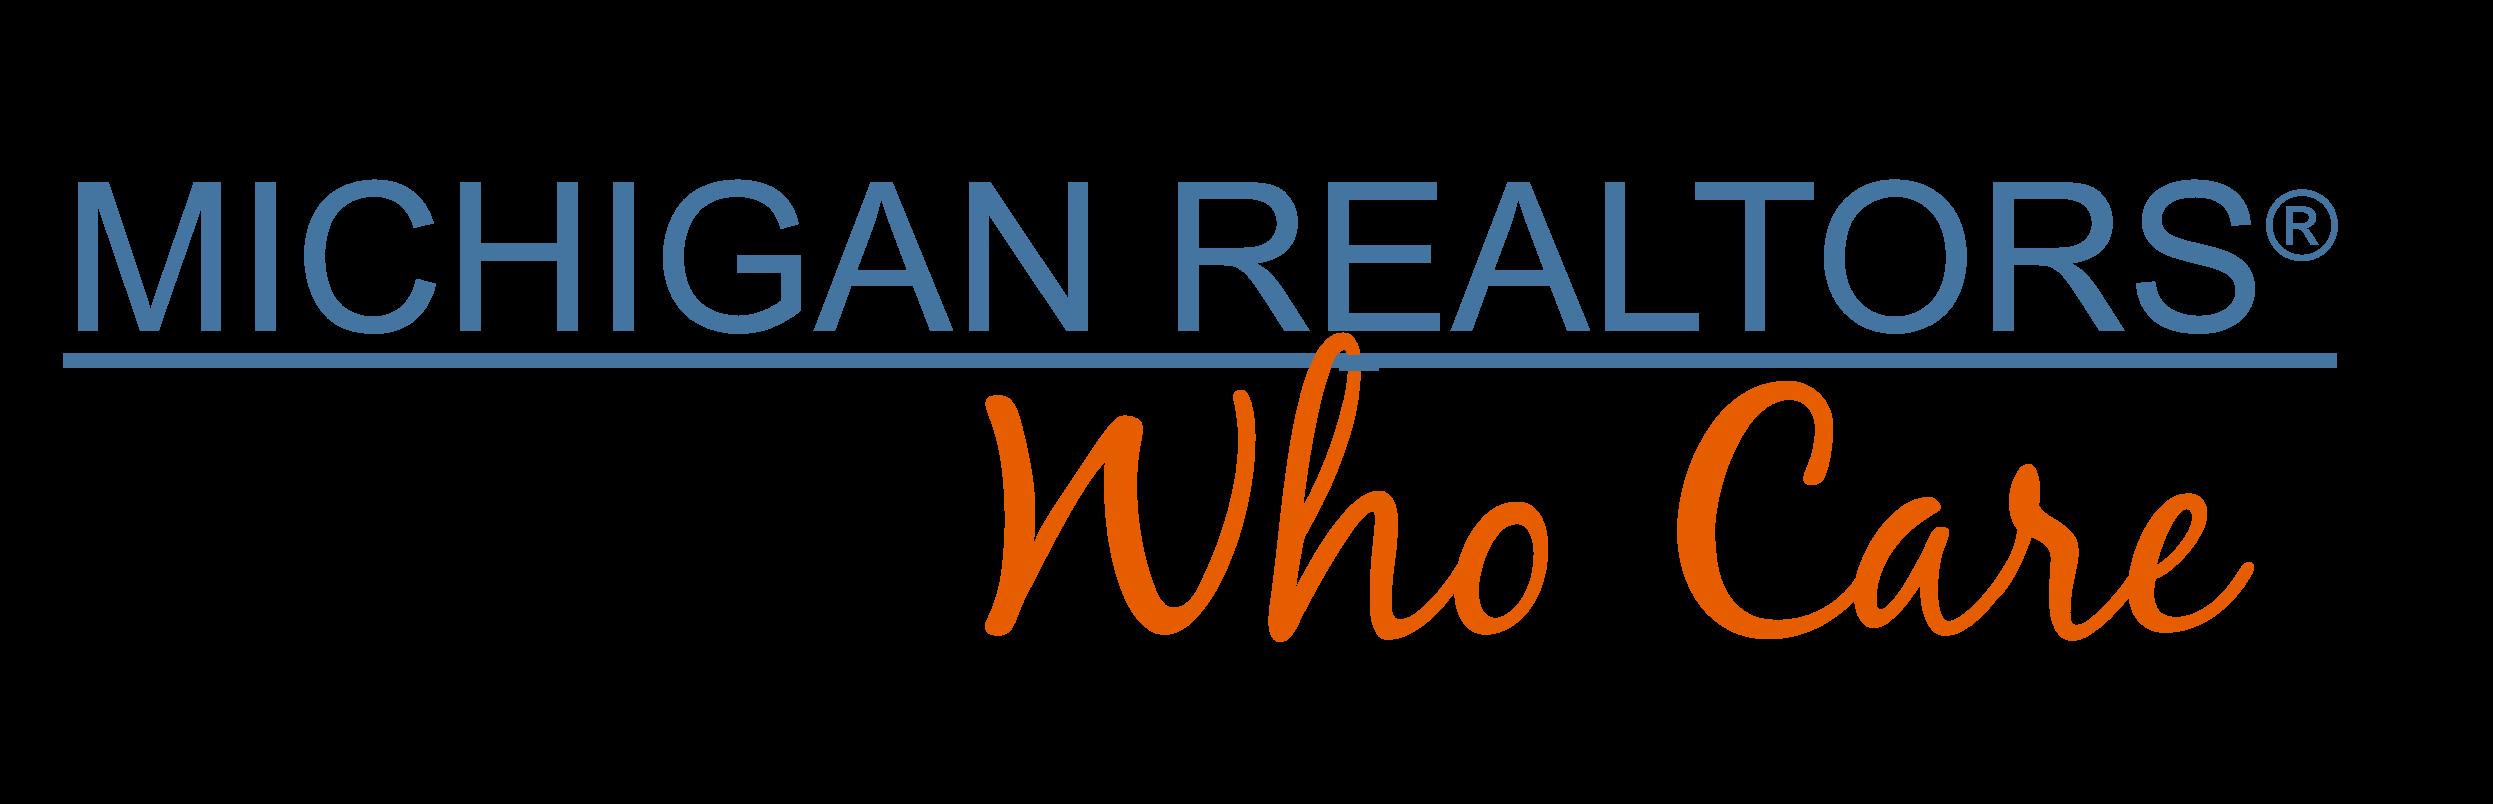 MRWC_logo_transparent.png